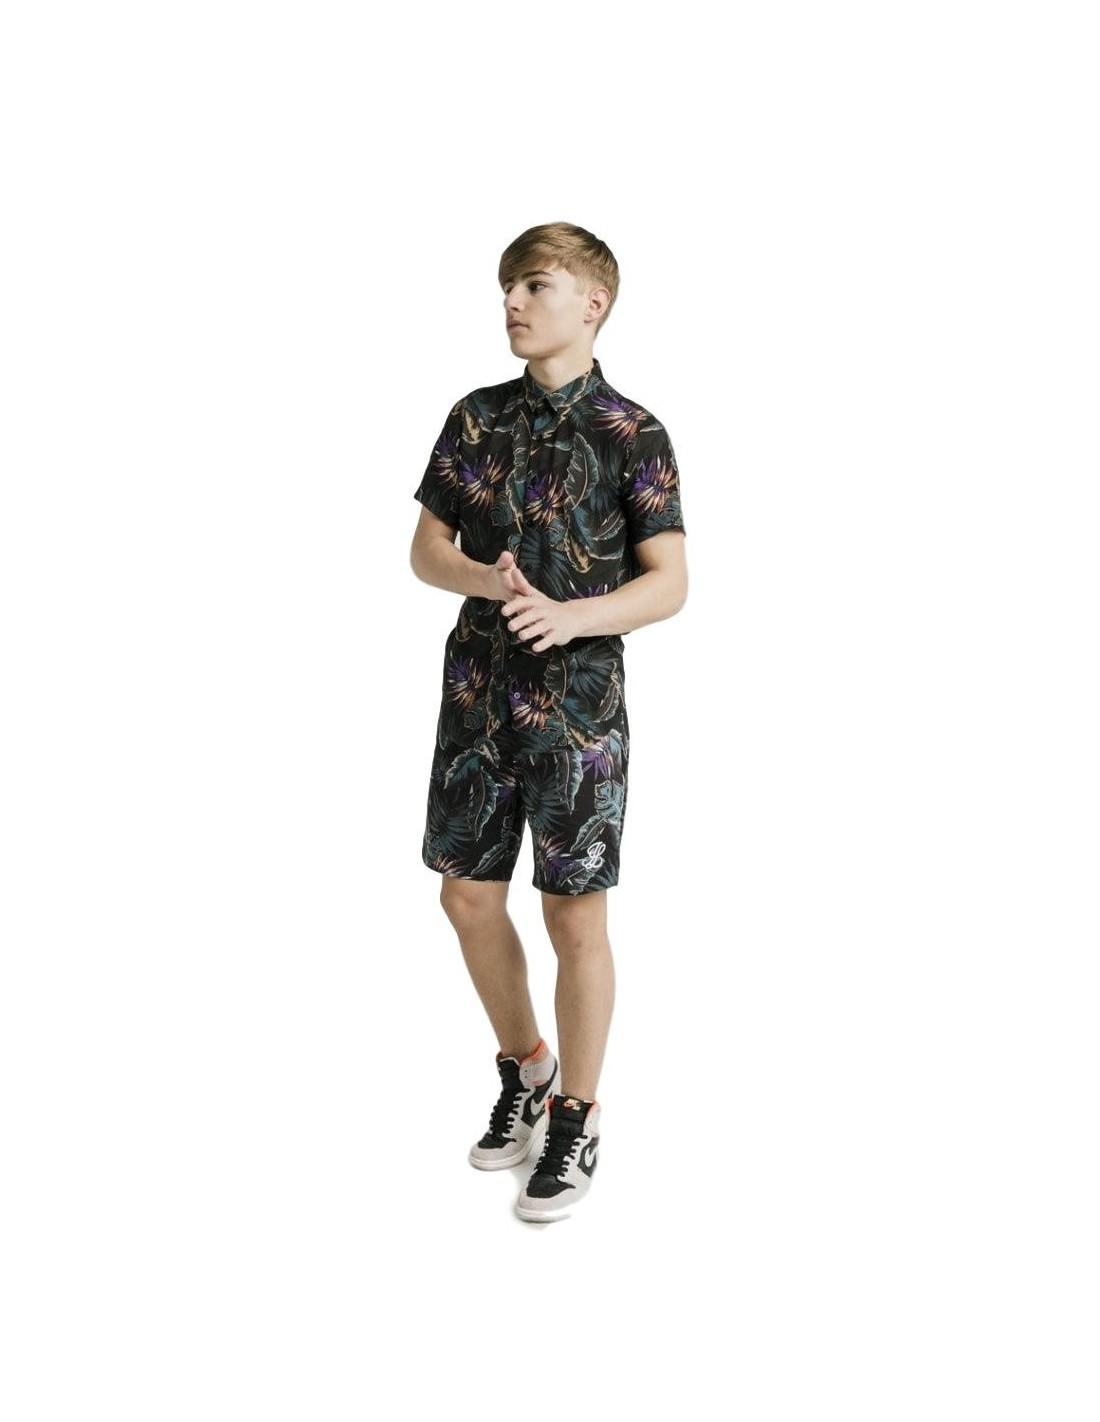 New ILLUSIVE LONDON Boys' Palm Swim Shorts